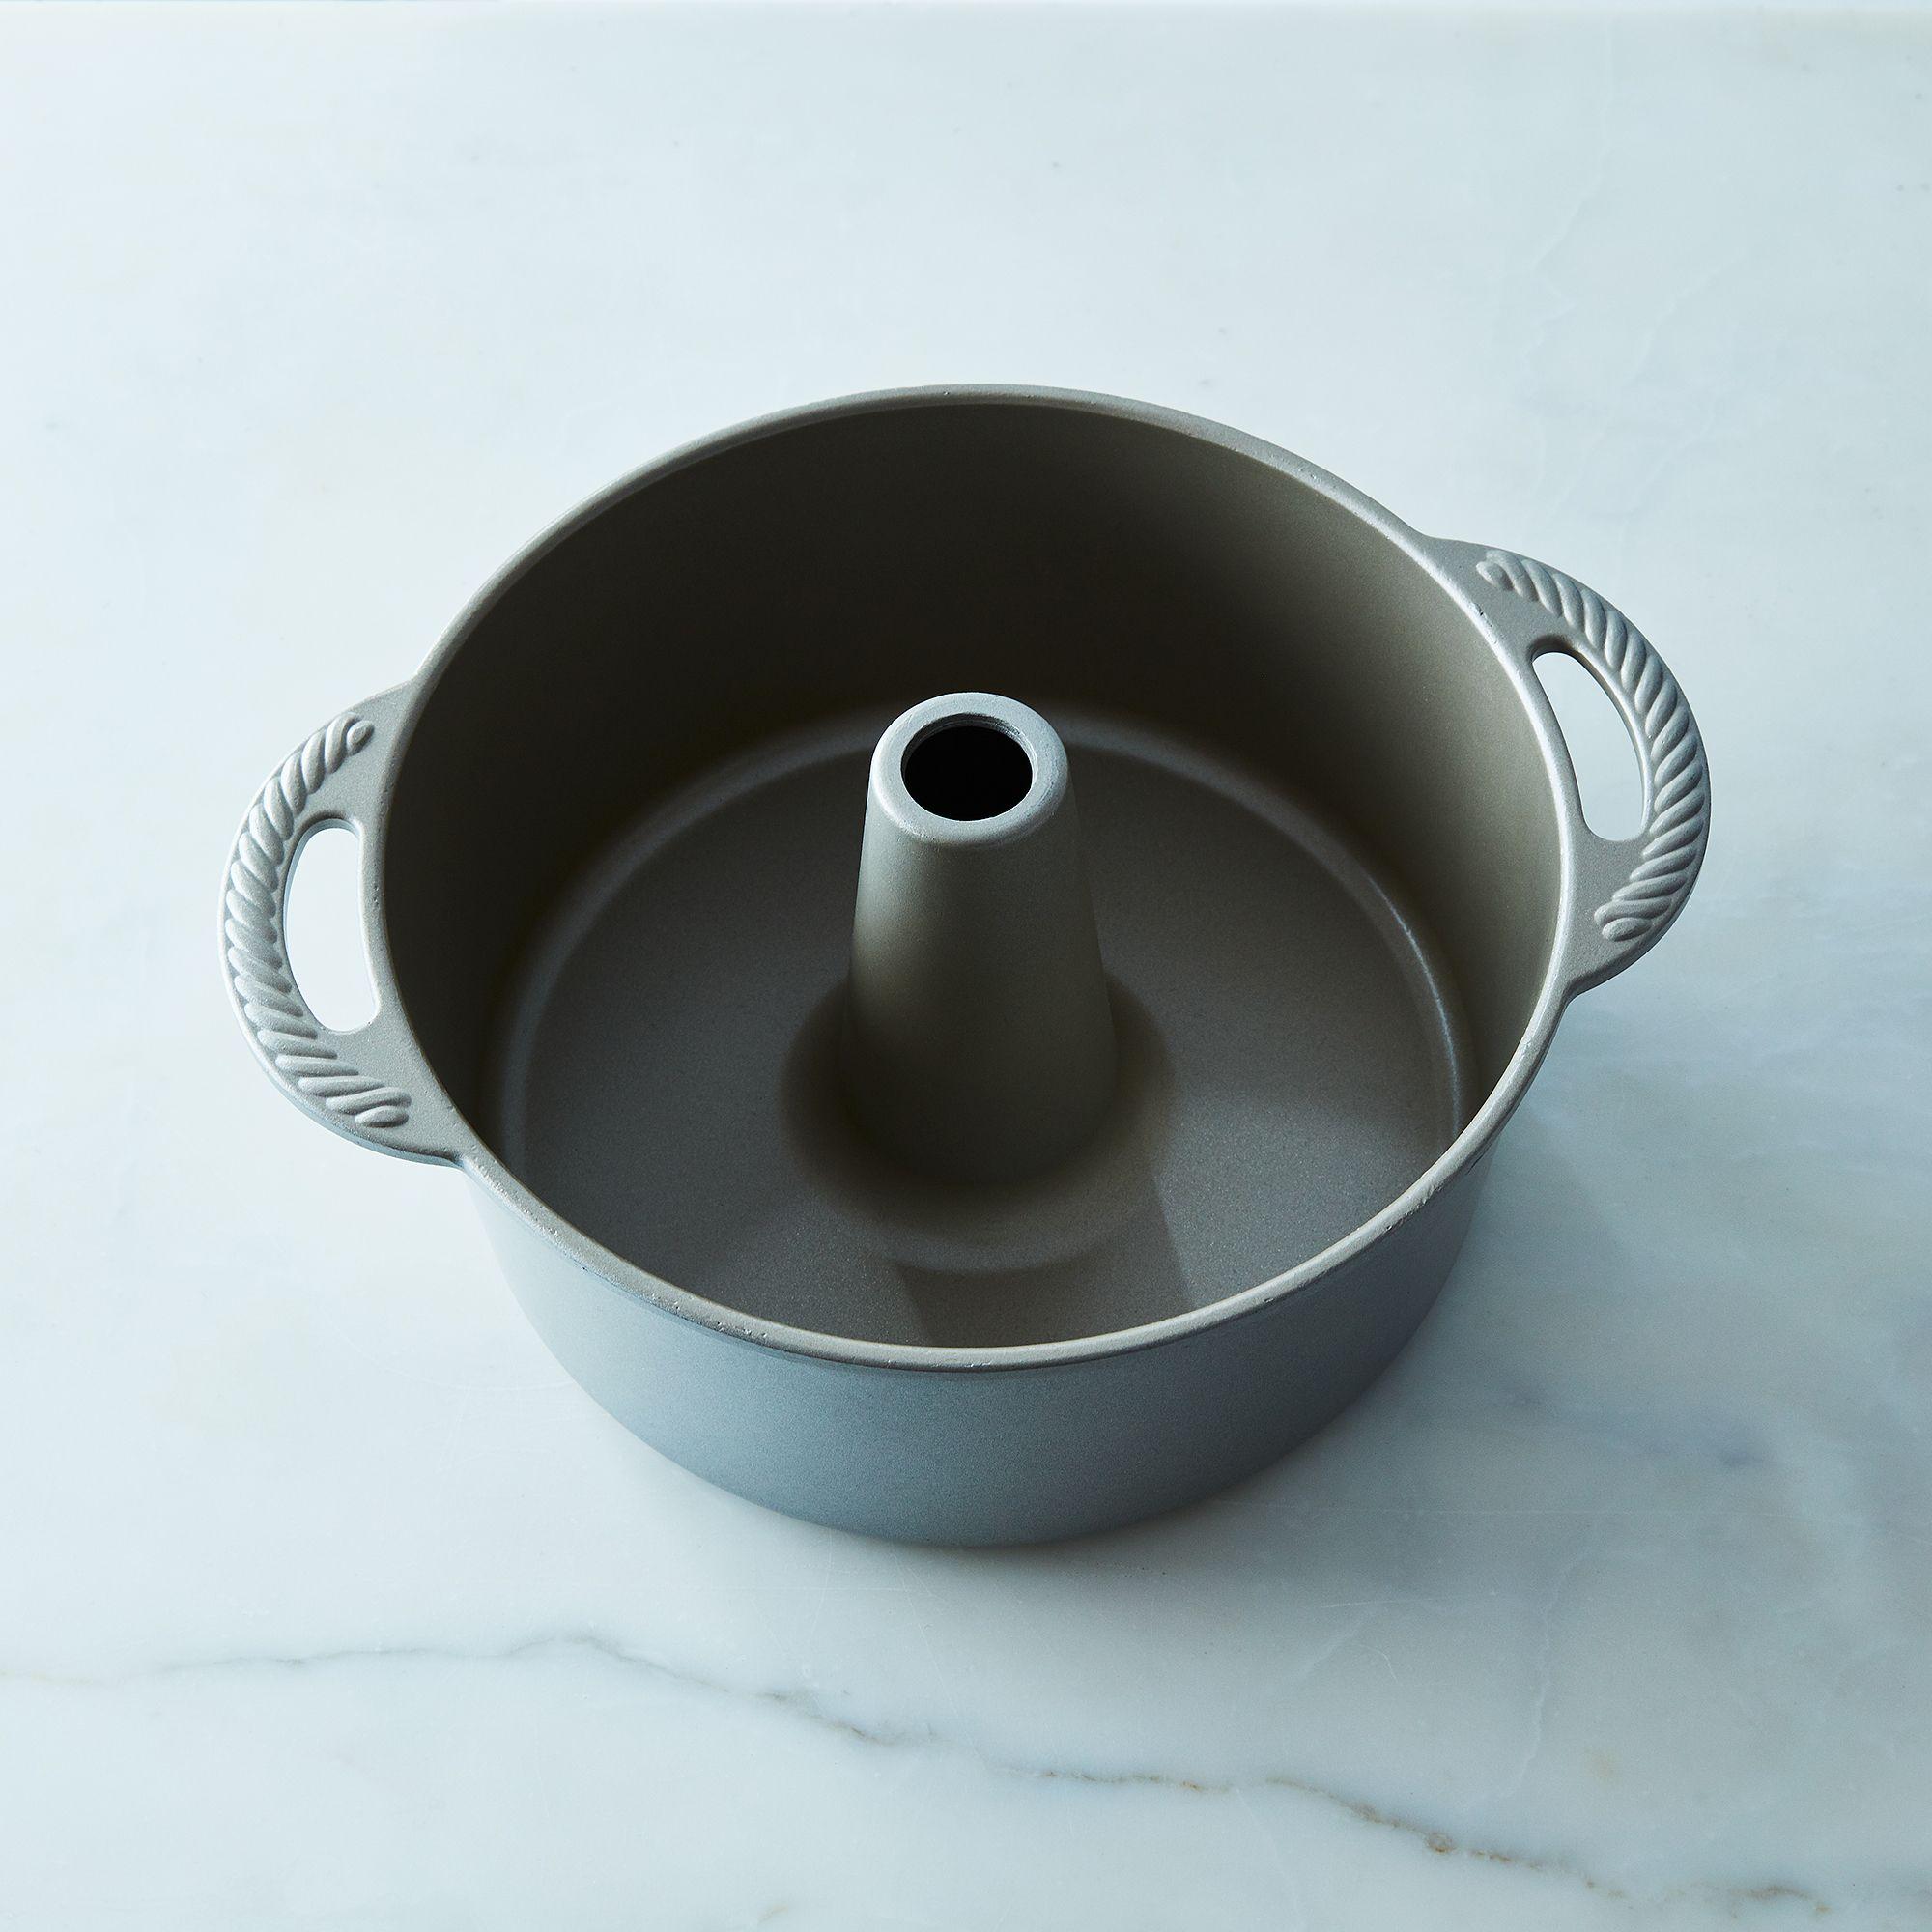 Nordic Ware Round Cake Pans (Set of 2) on Food52